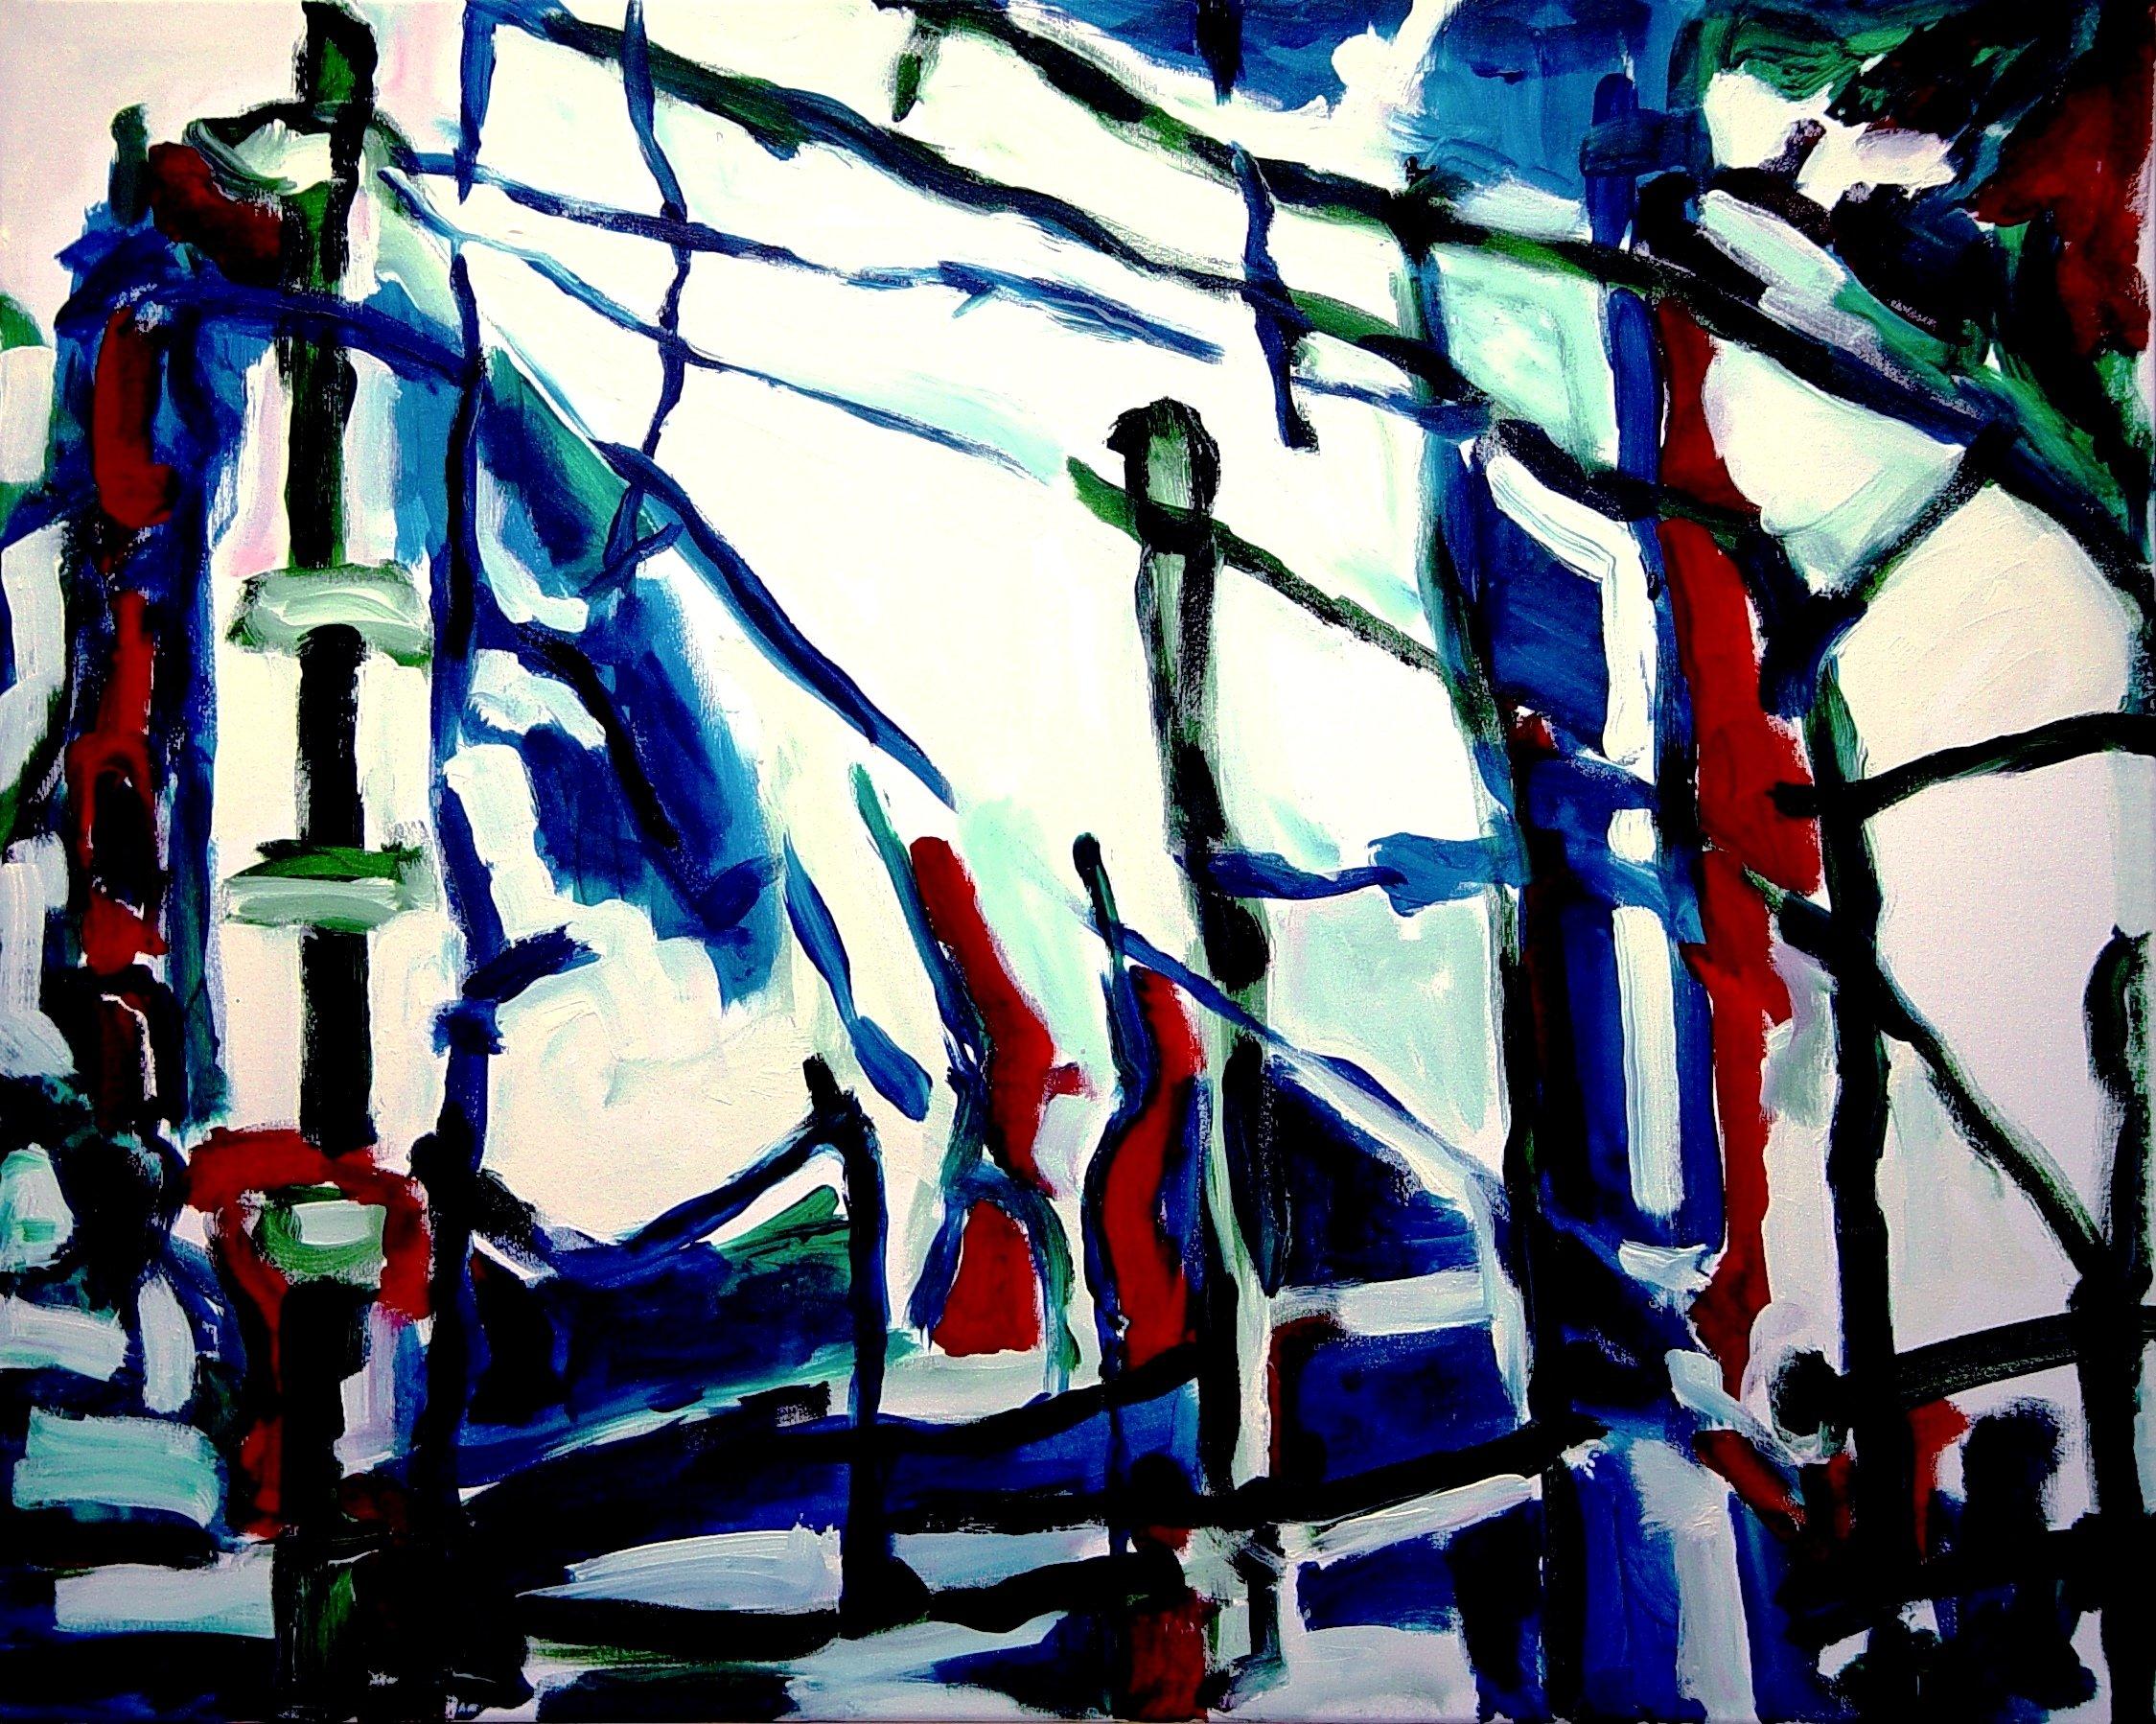 PerspektivWechsel, Acrylic on Canvas, 80cm x 100cm 2008